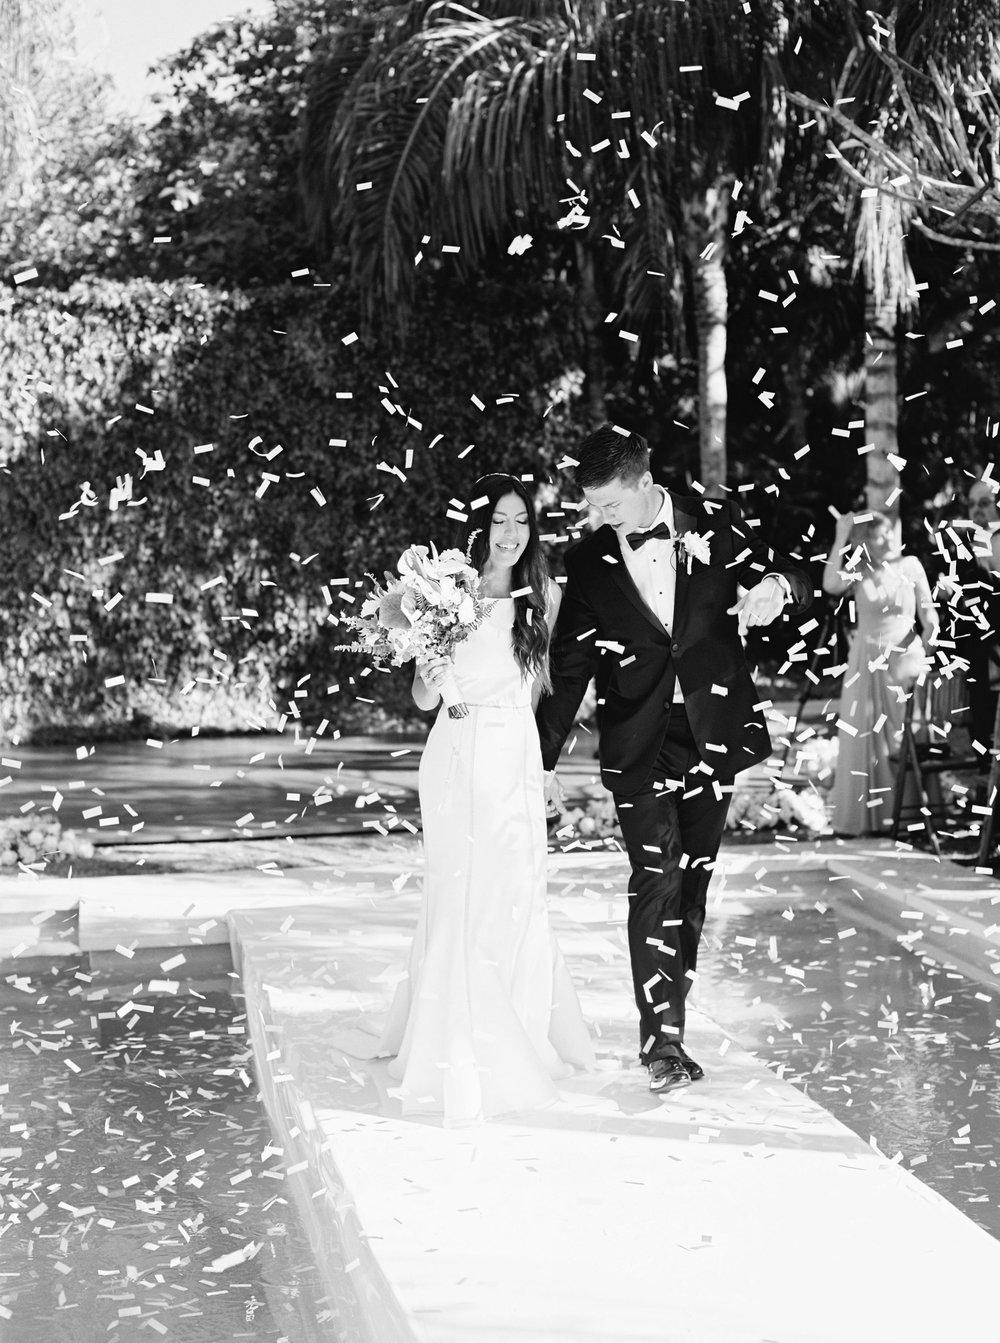 Kyle John l Fine Art Wedding Photography l Chicago, Copenhagen, California, New York, Destination l Blog l Brooke Boyd_The Film Poets_Tulum Wedding_16